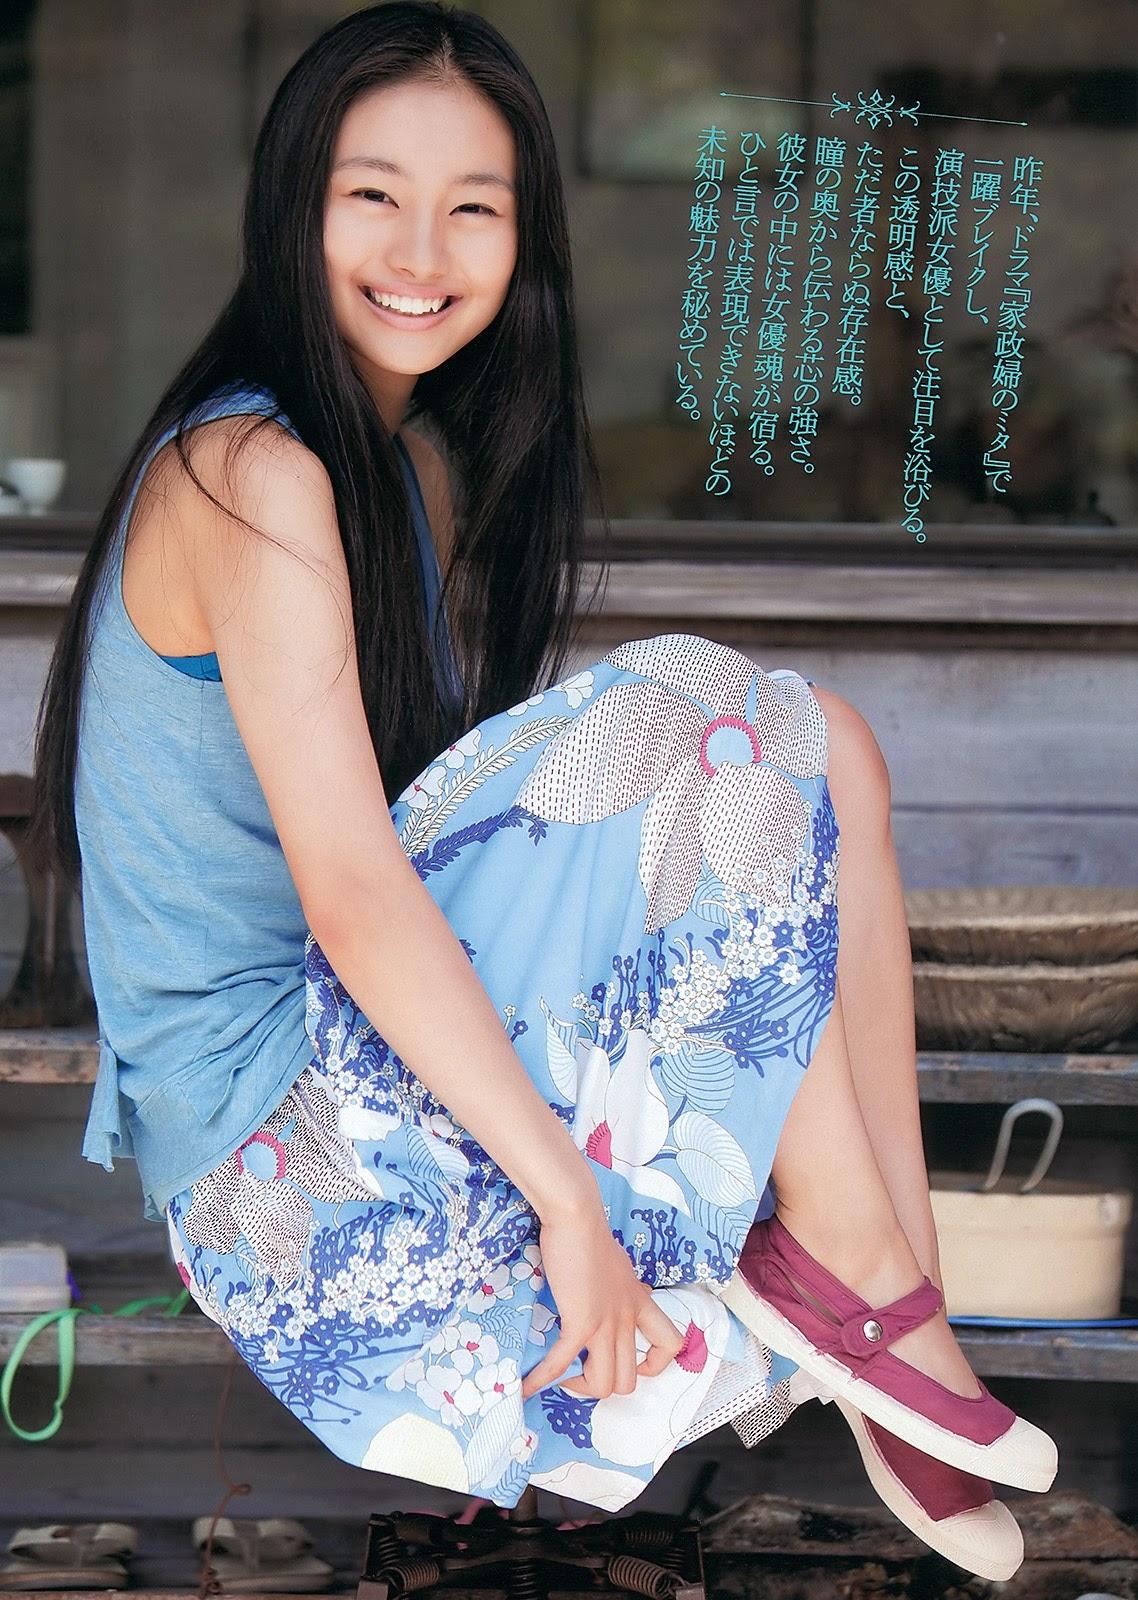 Kutsuna Shiori 忽那汐里 Weekly Playboy No 11 2012 Pictures 3